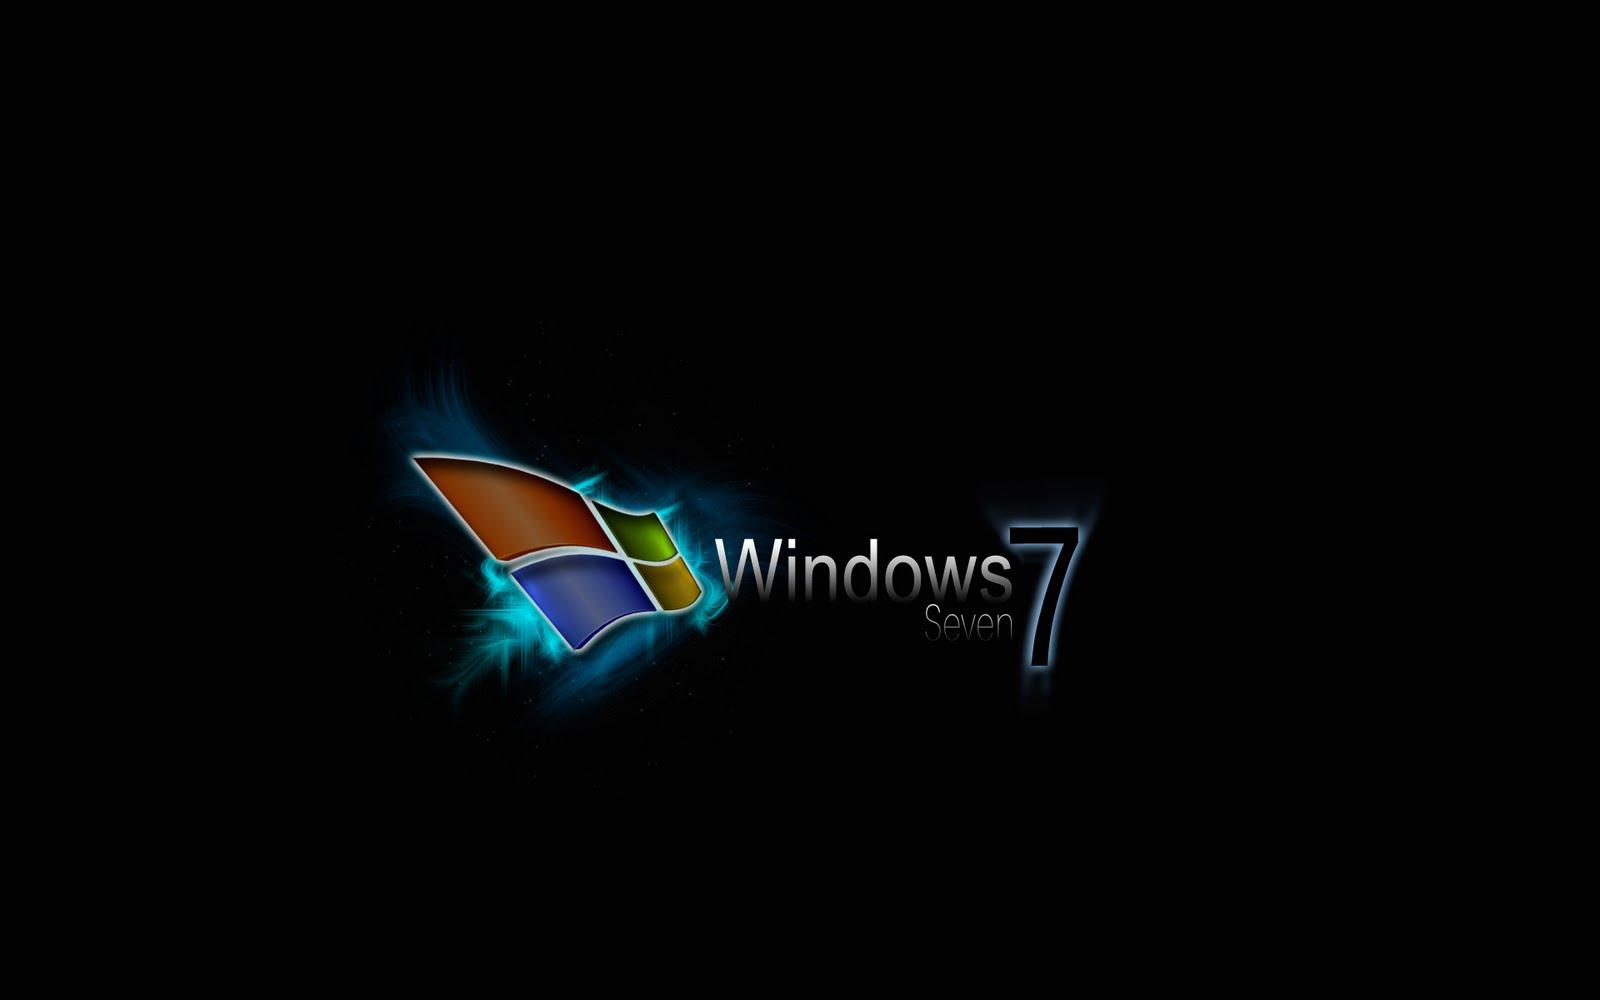 Windows 7 Wallpaper   1920x1200 Hd Desktop Wallpaper 1600x1000